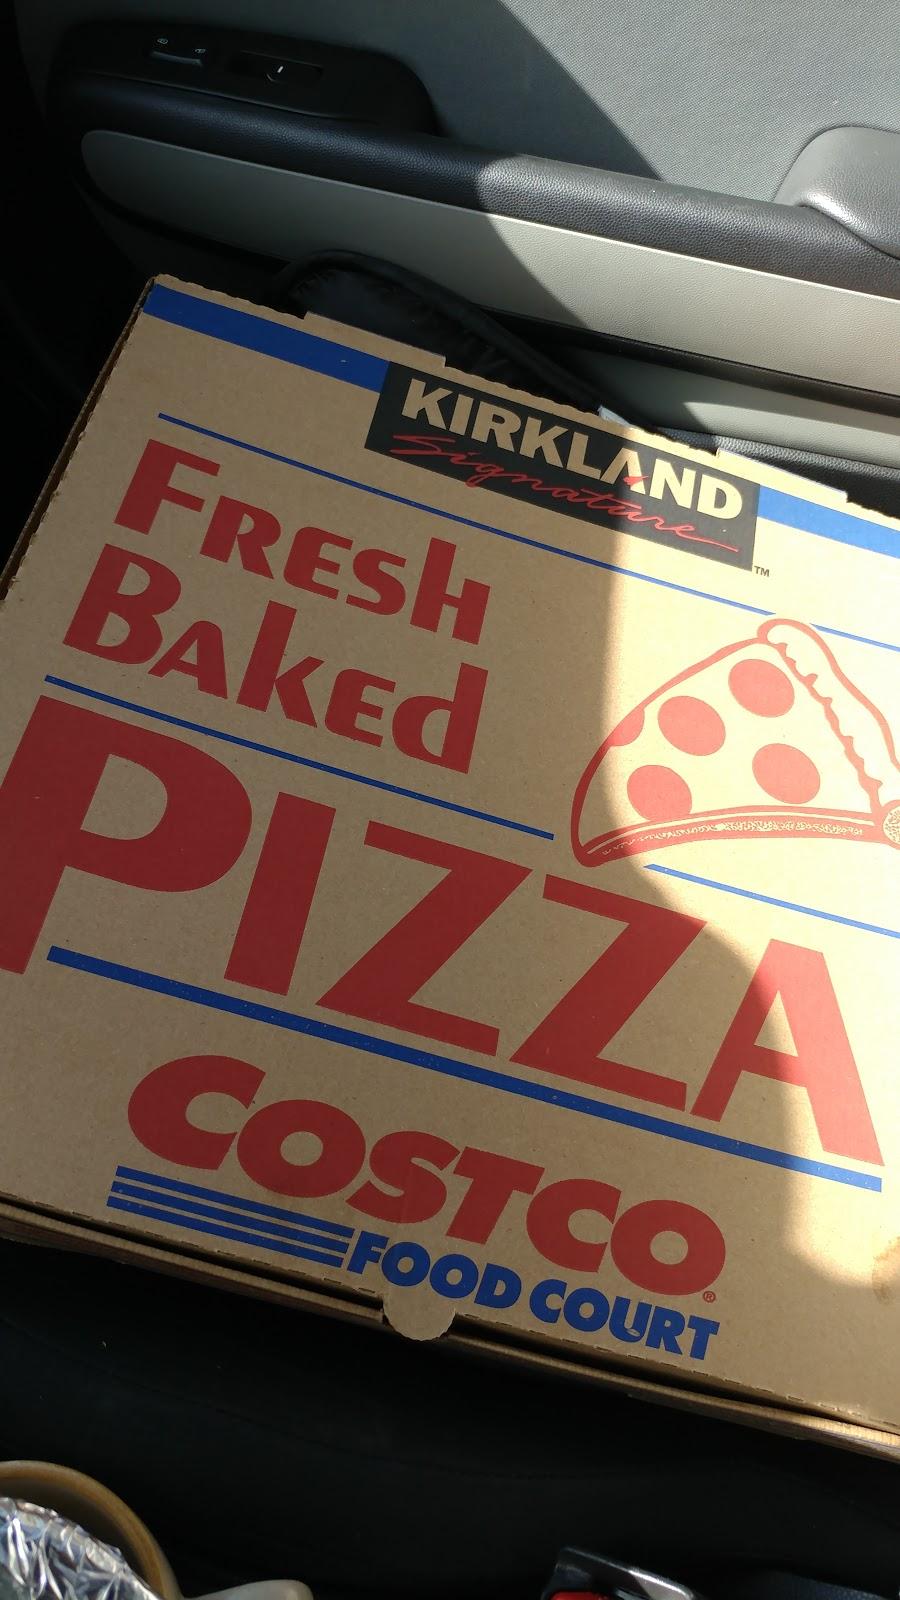 Costco Food Court - meal takeaway  | Photo 5 of 6 | Address: 17550 N 79th Ave, Glendale, AZ 85308, USA | Phone: (623) 776-4003